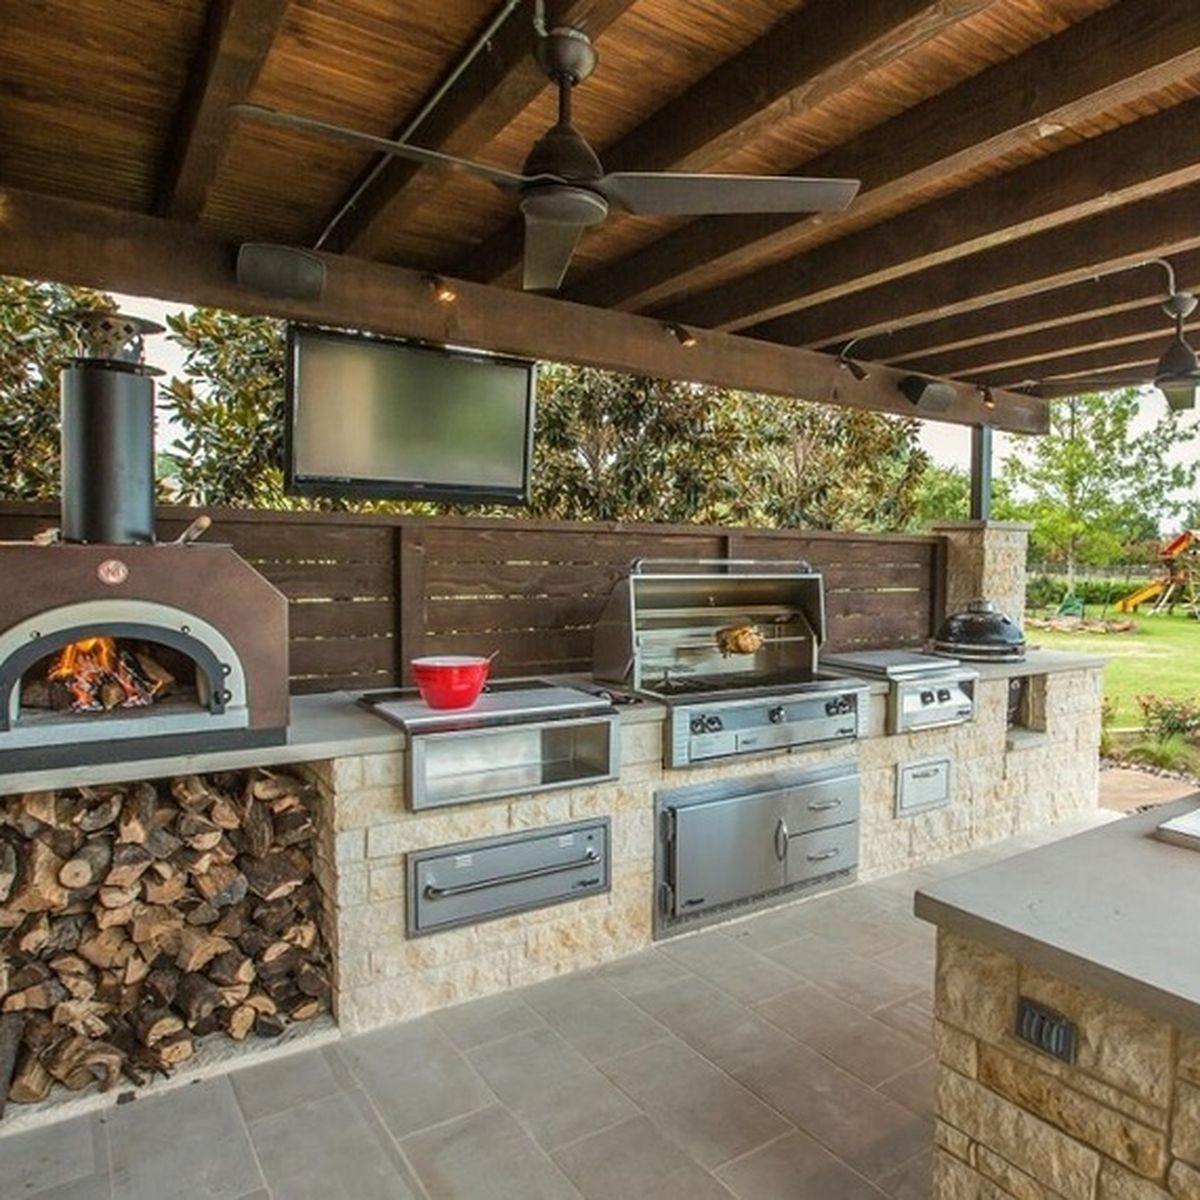 13 backyard kitchens that make us want to live outside